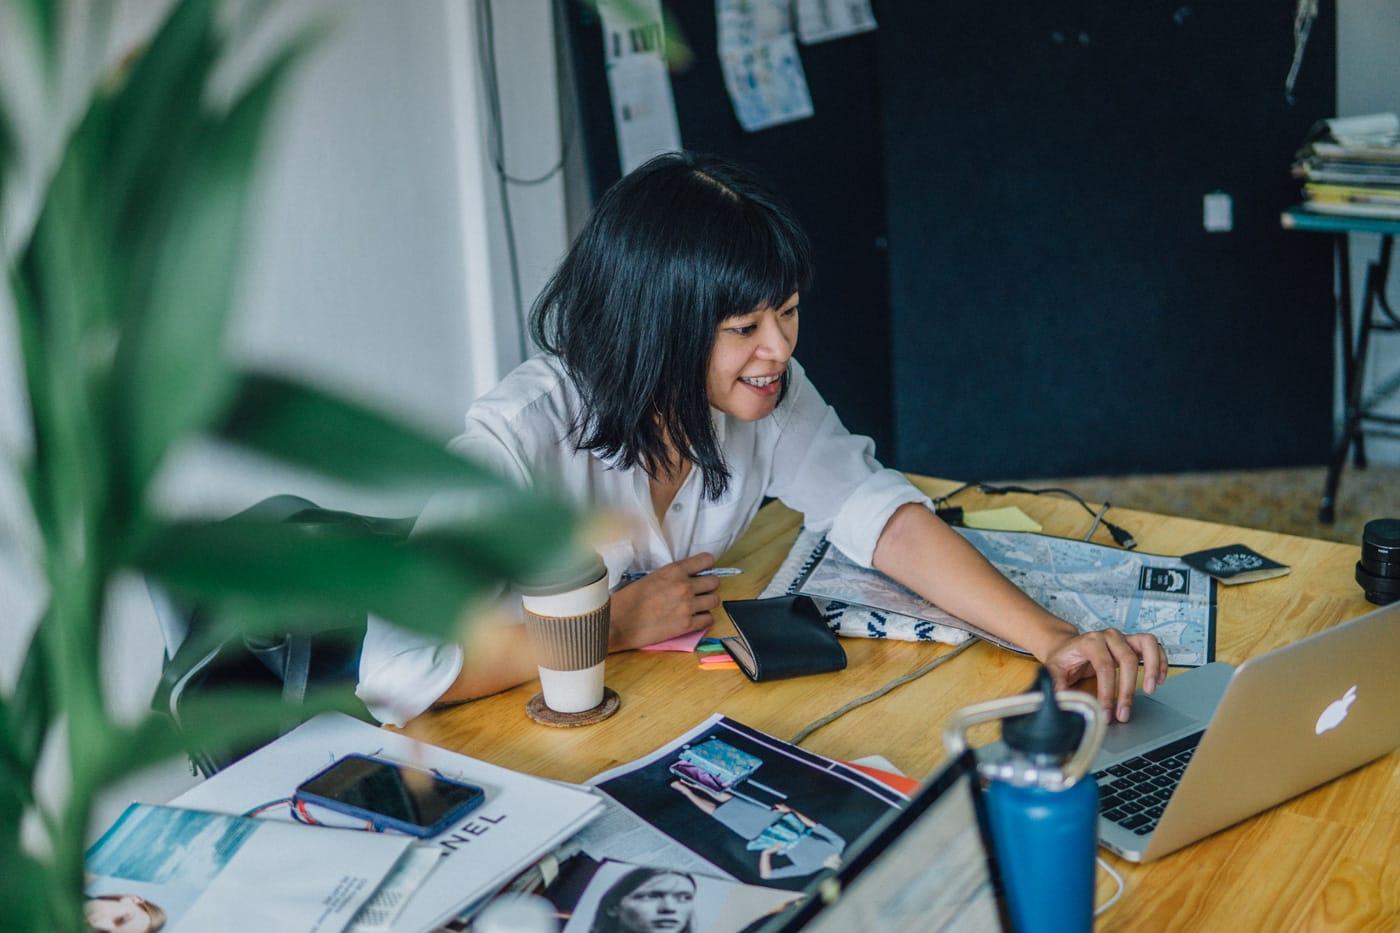 Linda Mai Phung